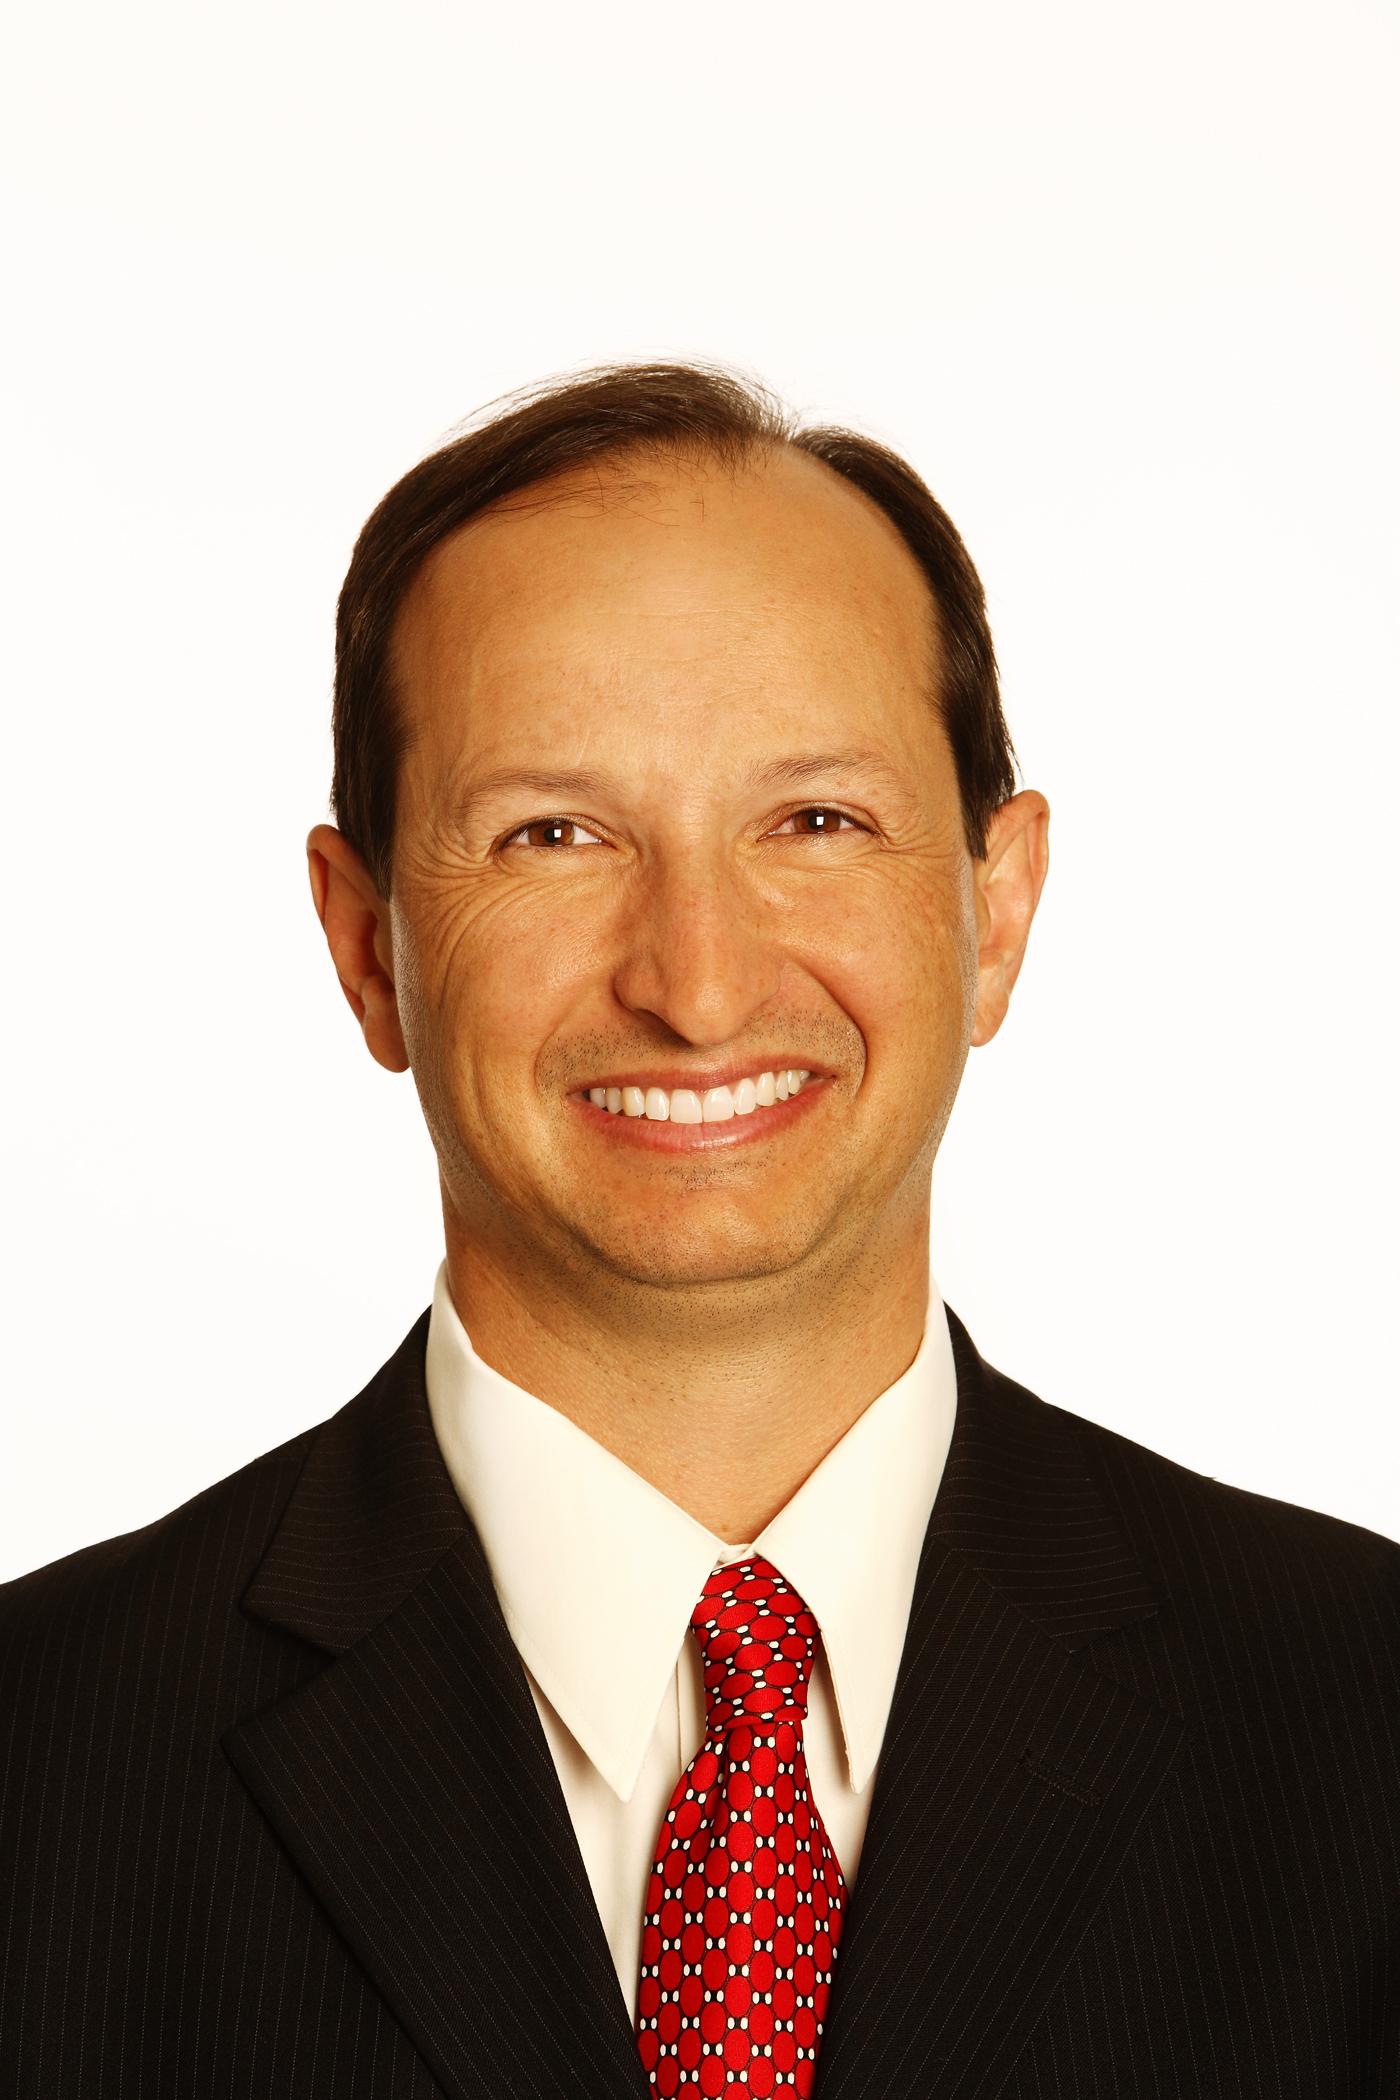 Mr. <b>John Mark</b> Staude, CEO at Riverside Resources, will be visiting Argentina ... - John-Mark-Staude-2011